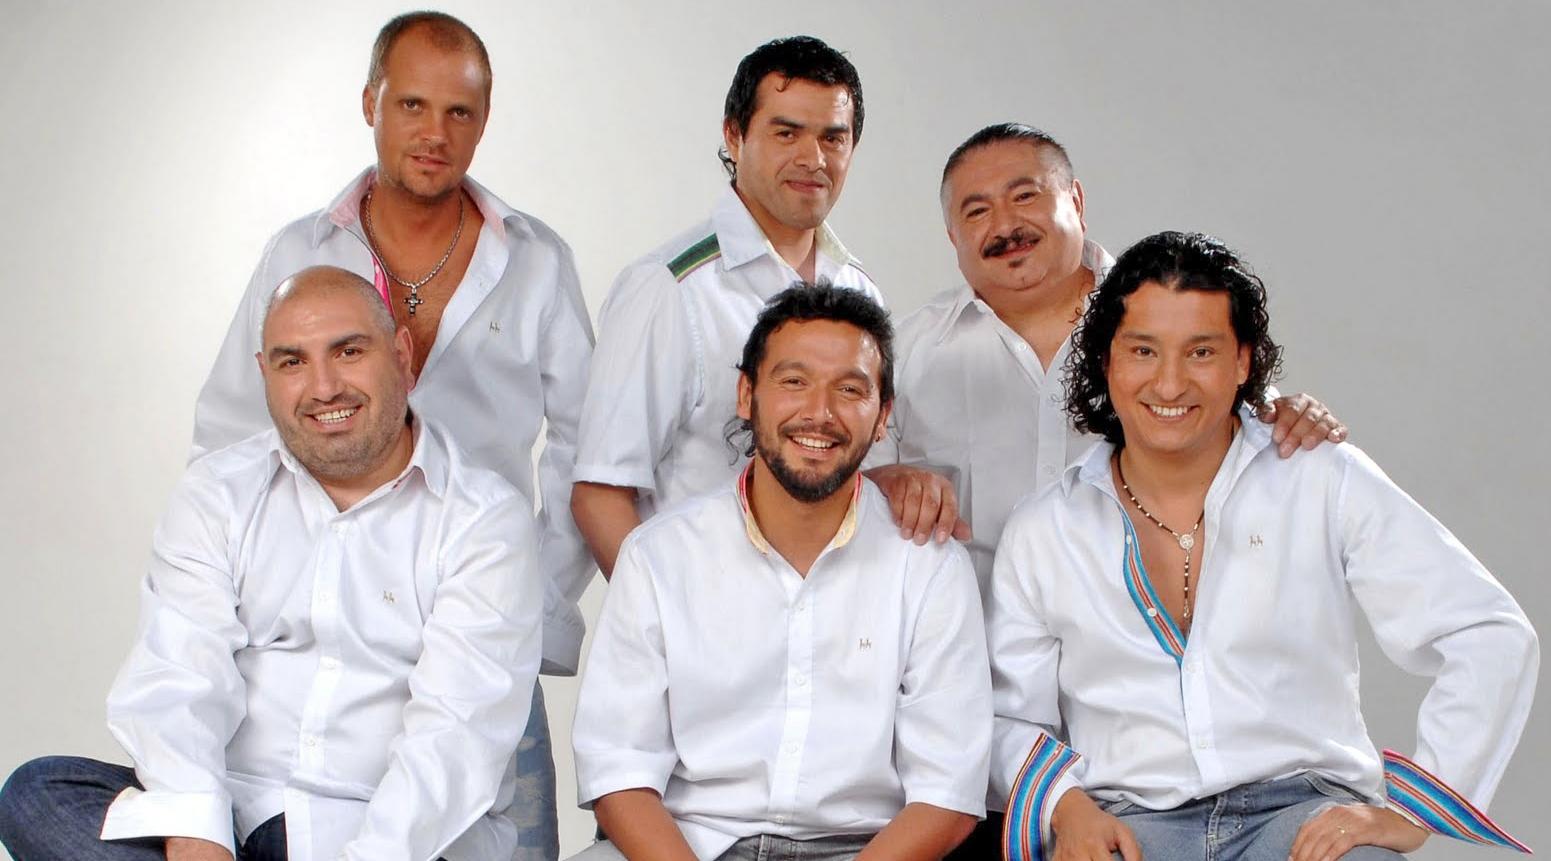 festivales en córdoba 2019